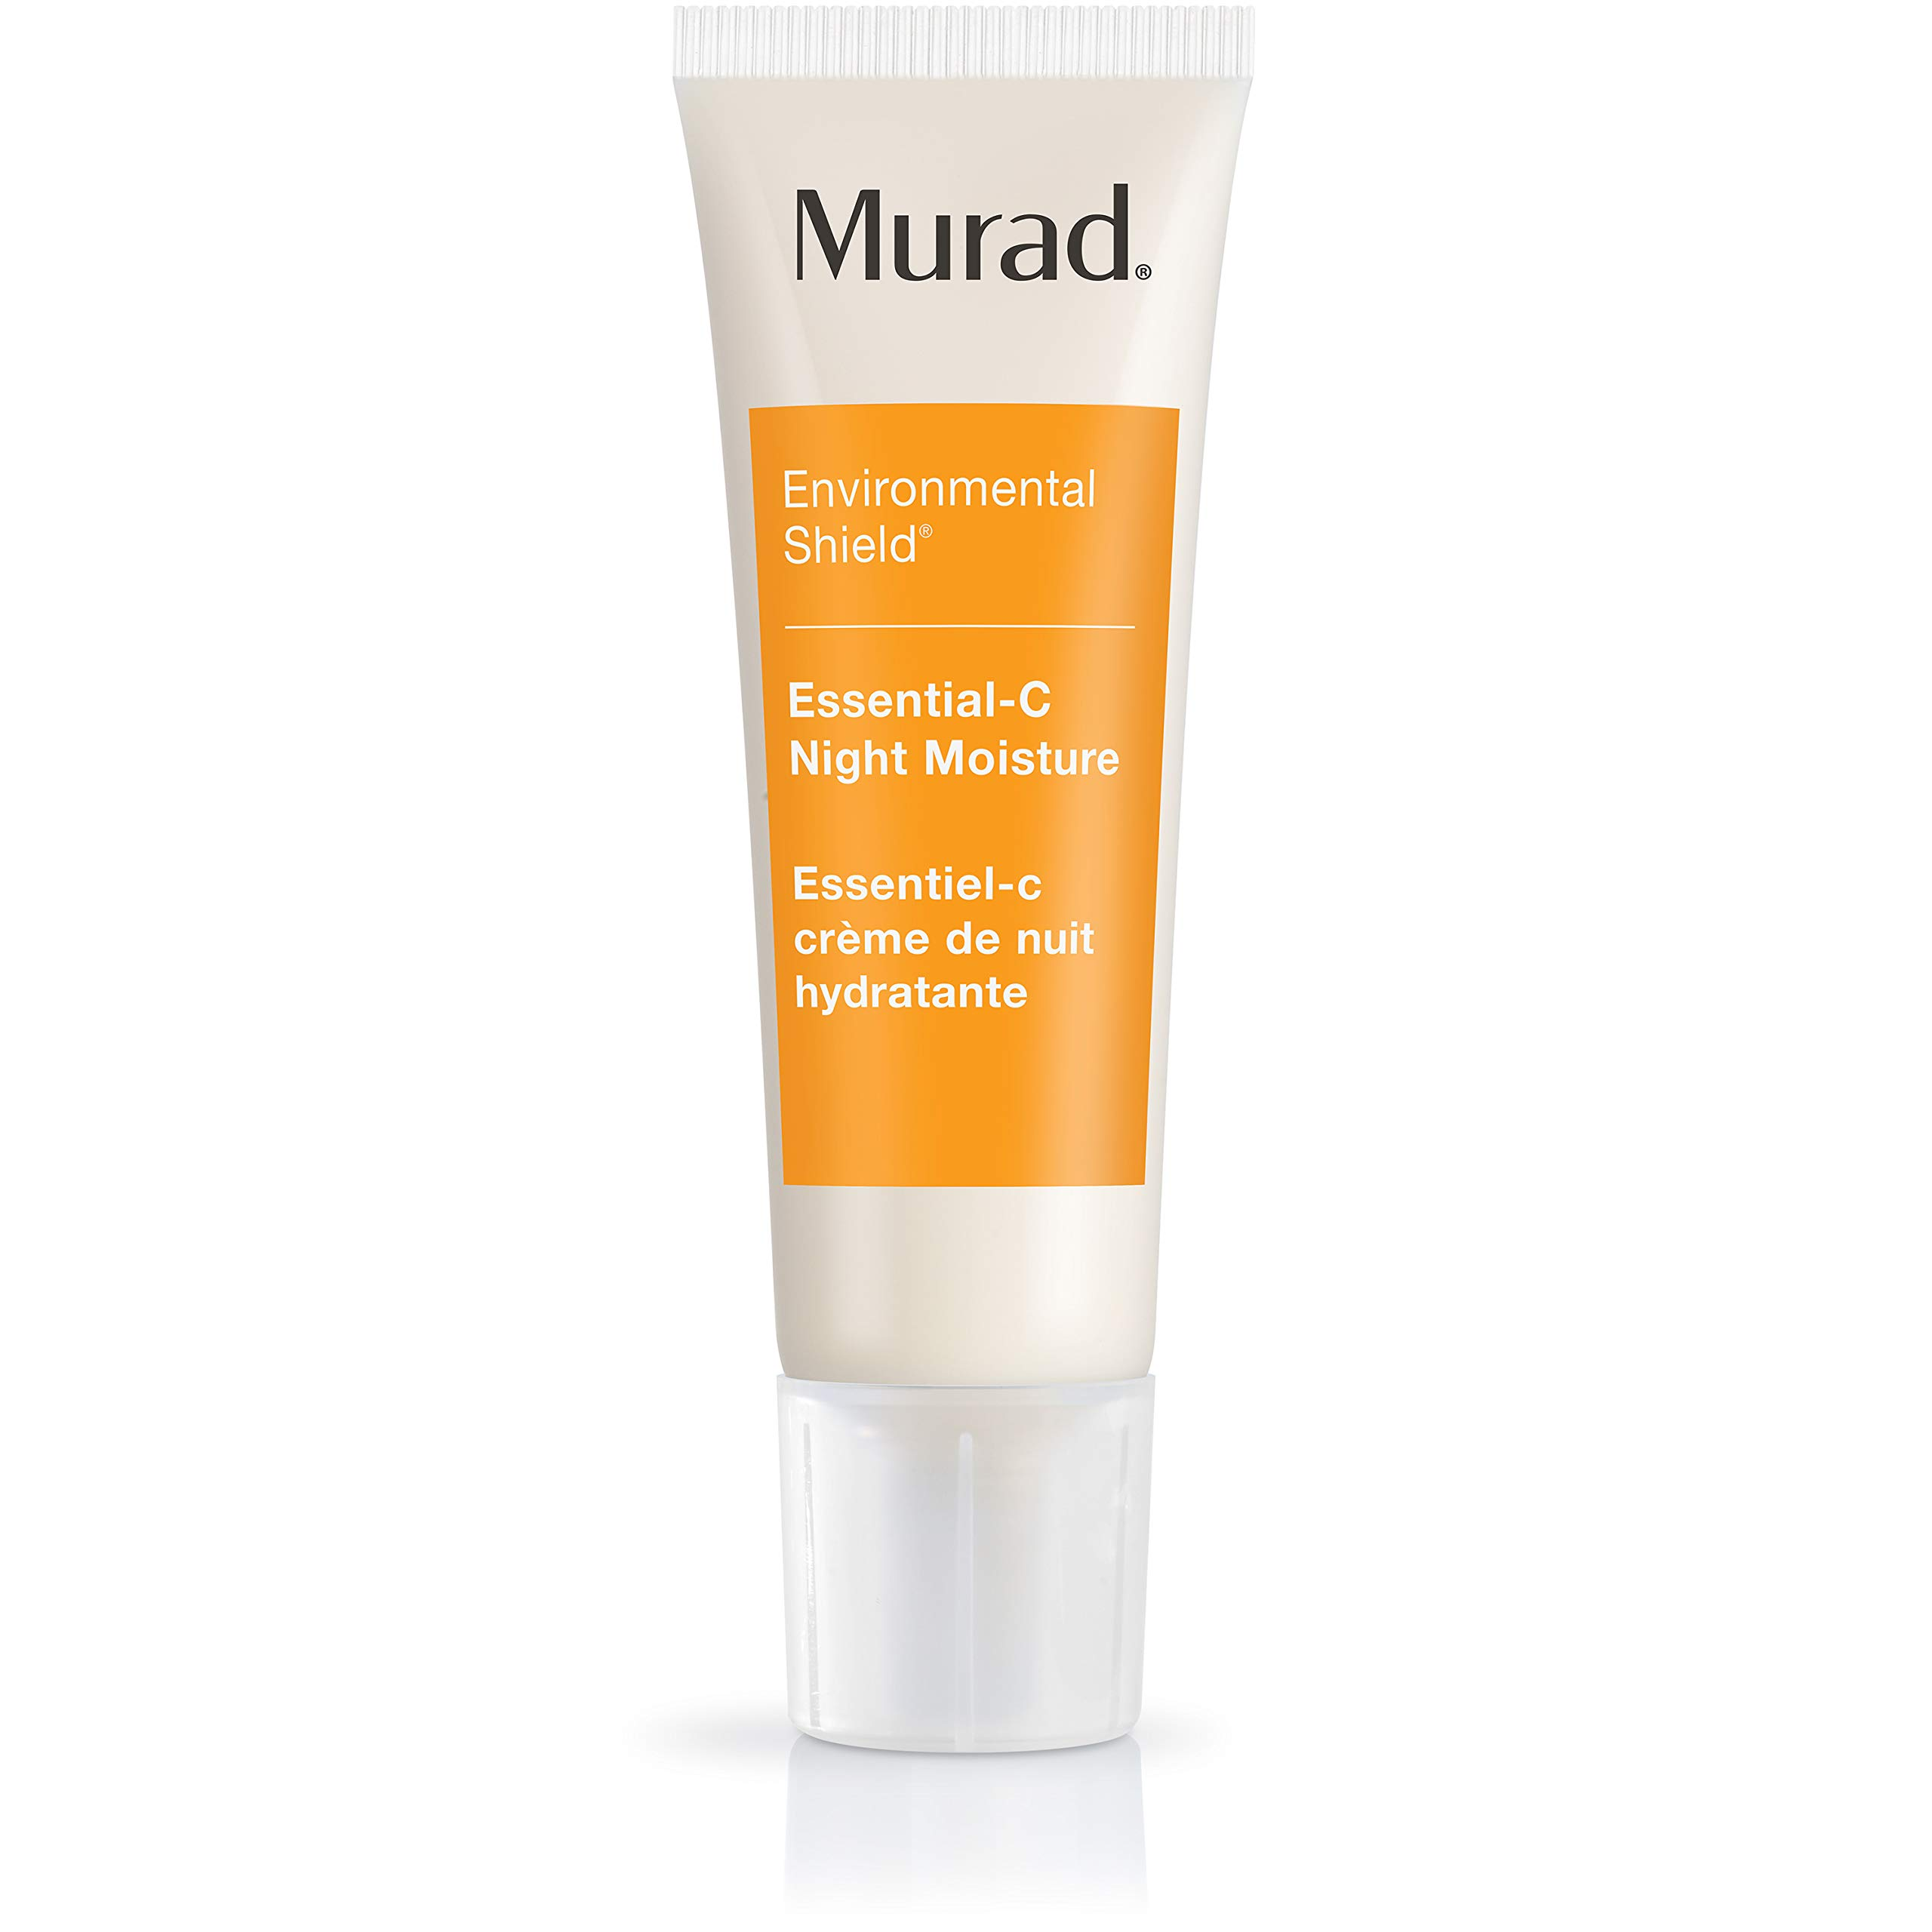 Murad Environmental Shield Essential-C Night Moisture, 3: Hydrate/Protect, 1.7 fl oz (50 ml)